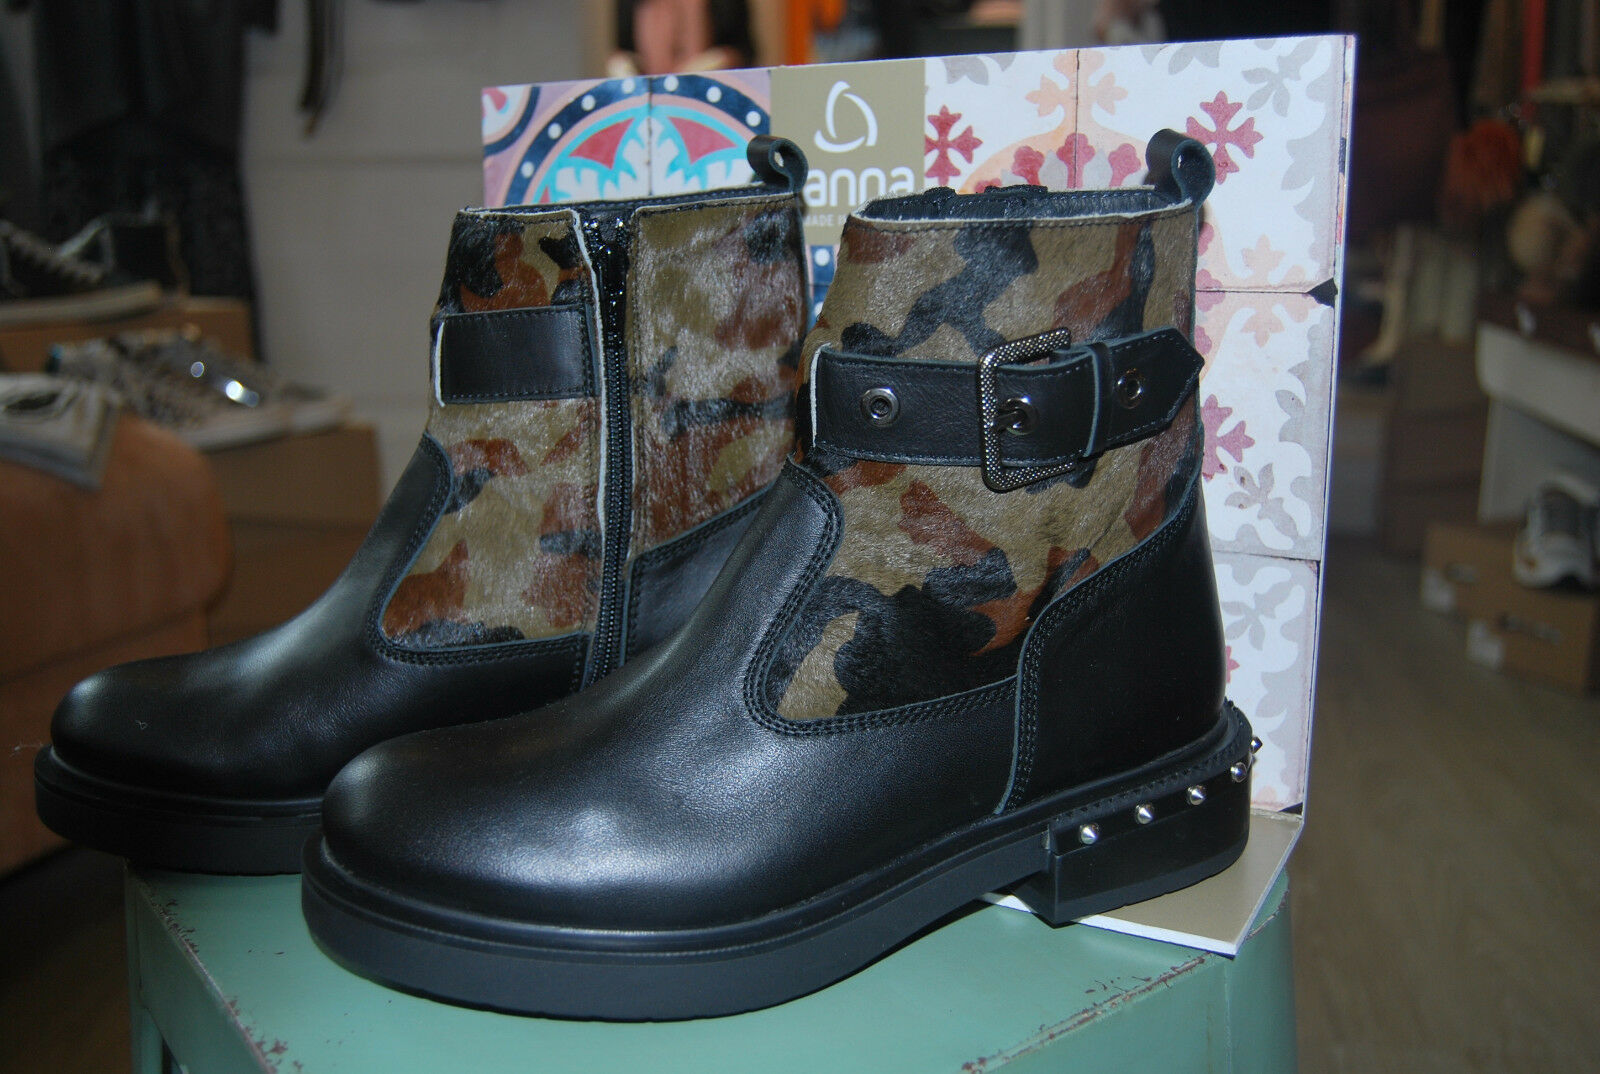 Grandes zapatos con descuento Kanna Shoes Boots Pony Negro Camouflage